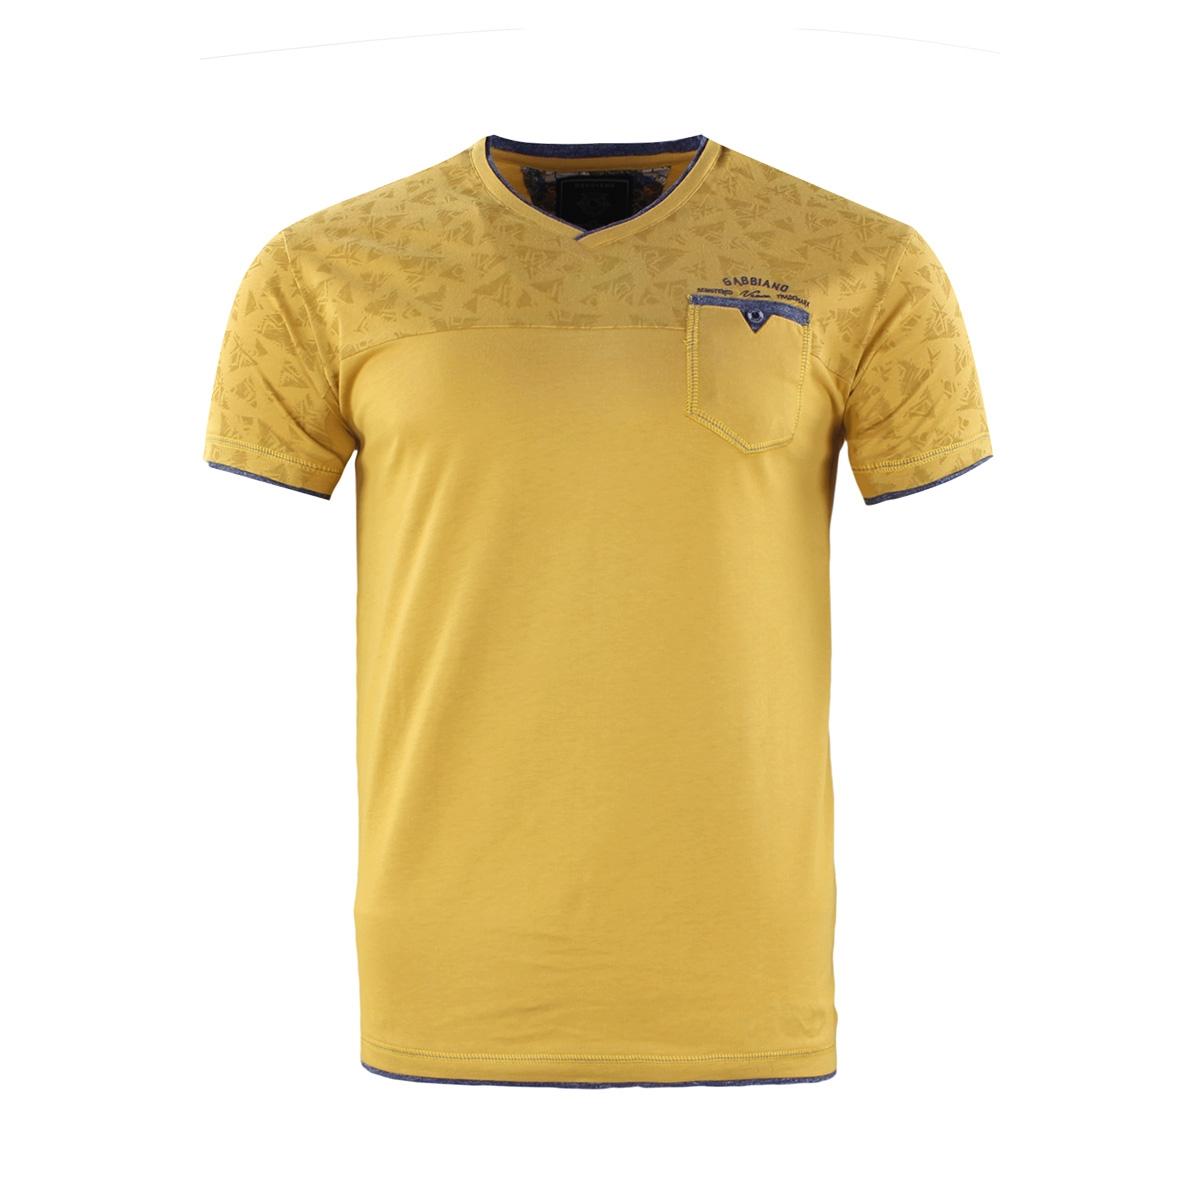 t shirt 15177 gabbiano t-shirt yellow